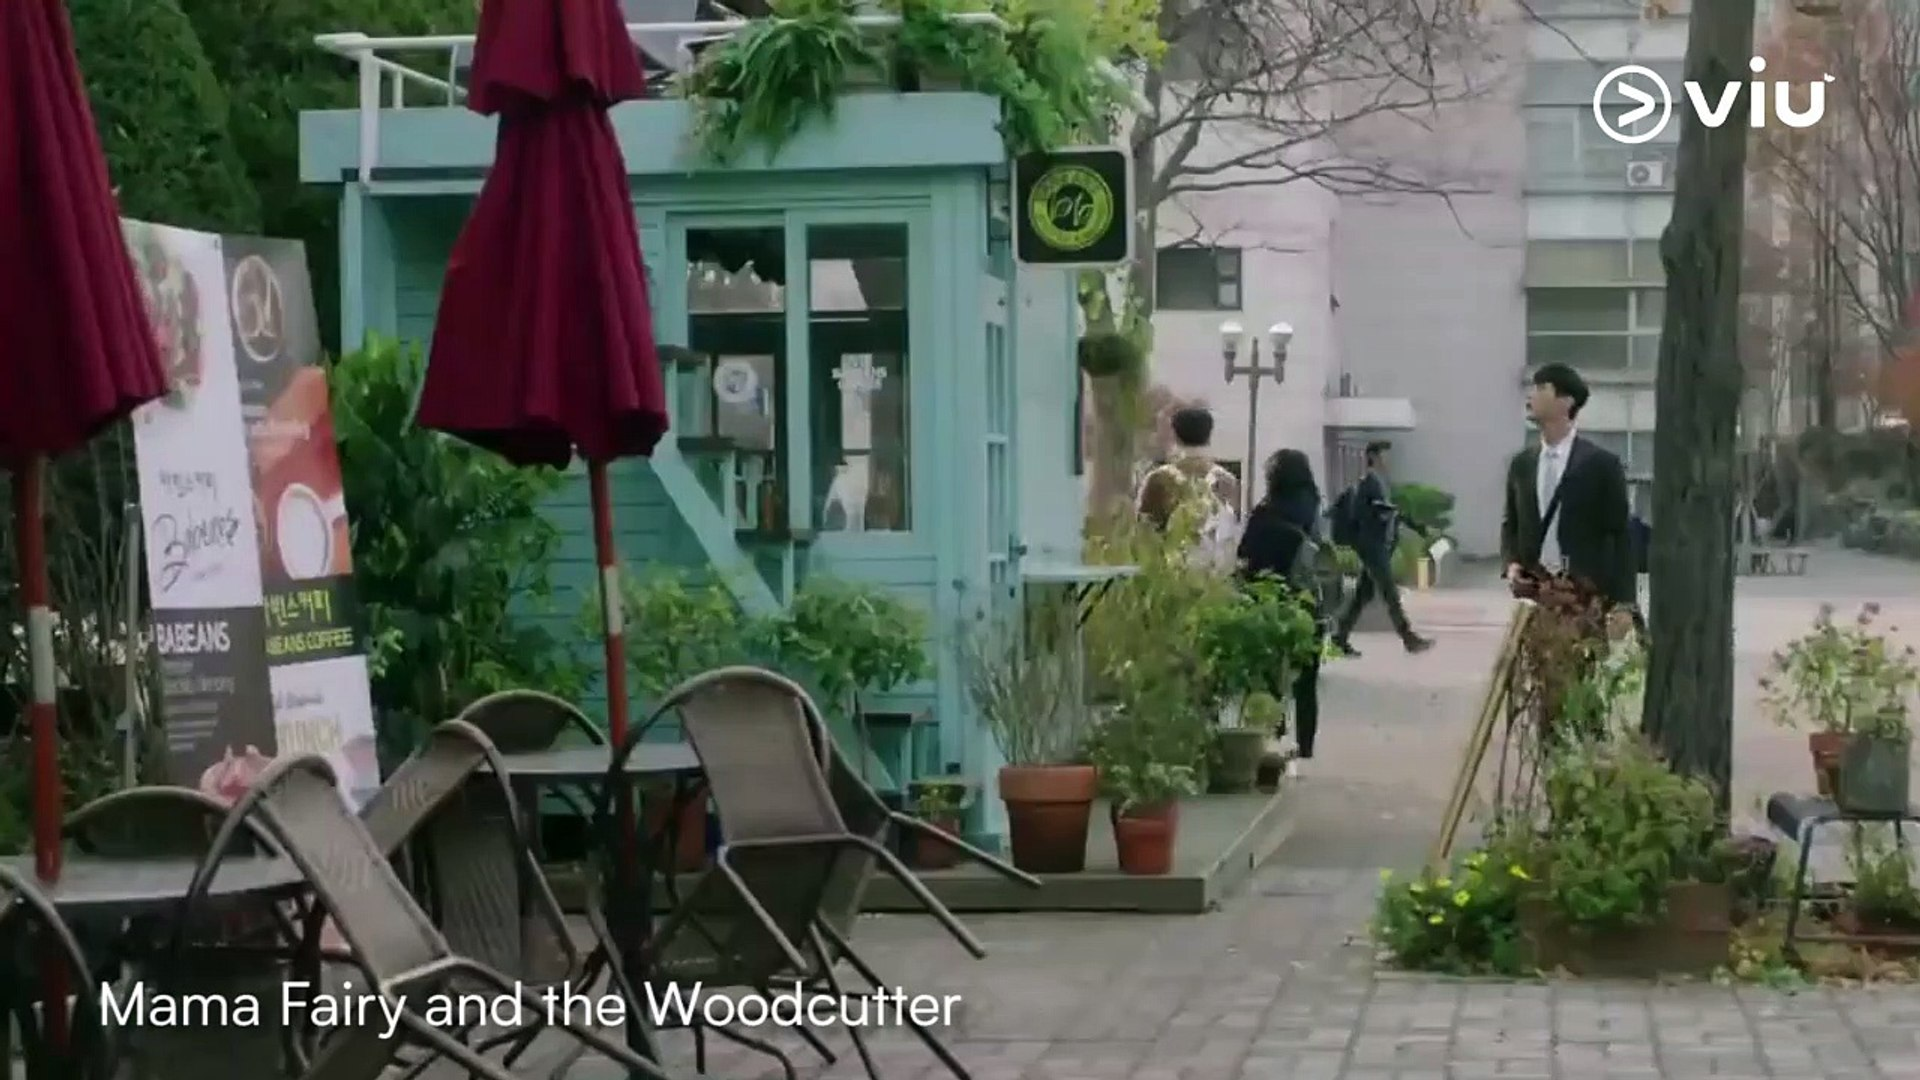 Mama Fairy and the Woodcutter - Preview Ep  14   Drama Korea   Starring  Moon Chae Won, Yoo Hyun Min, Seo Ji Hoon